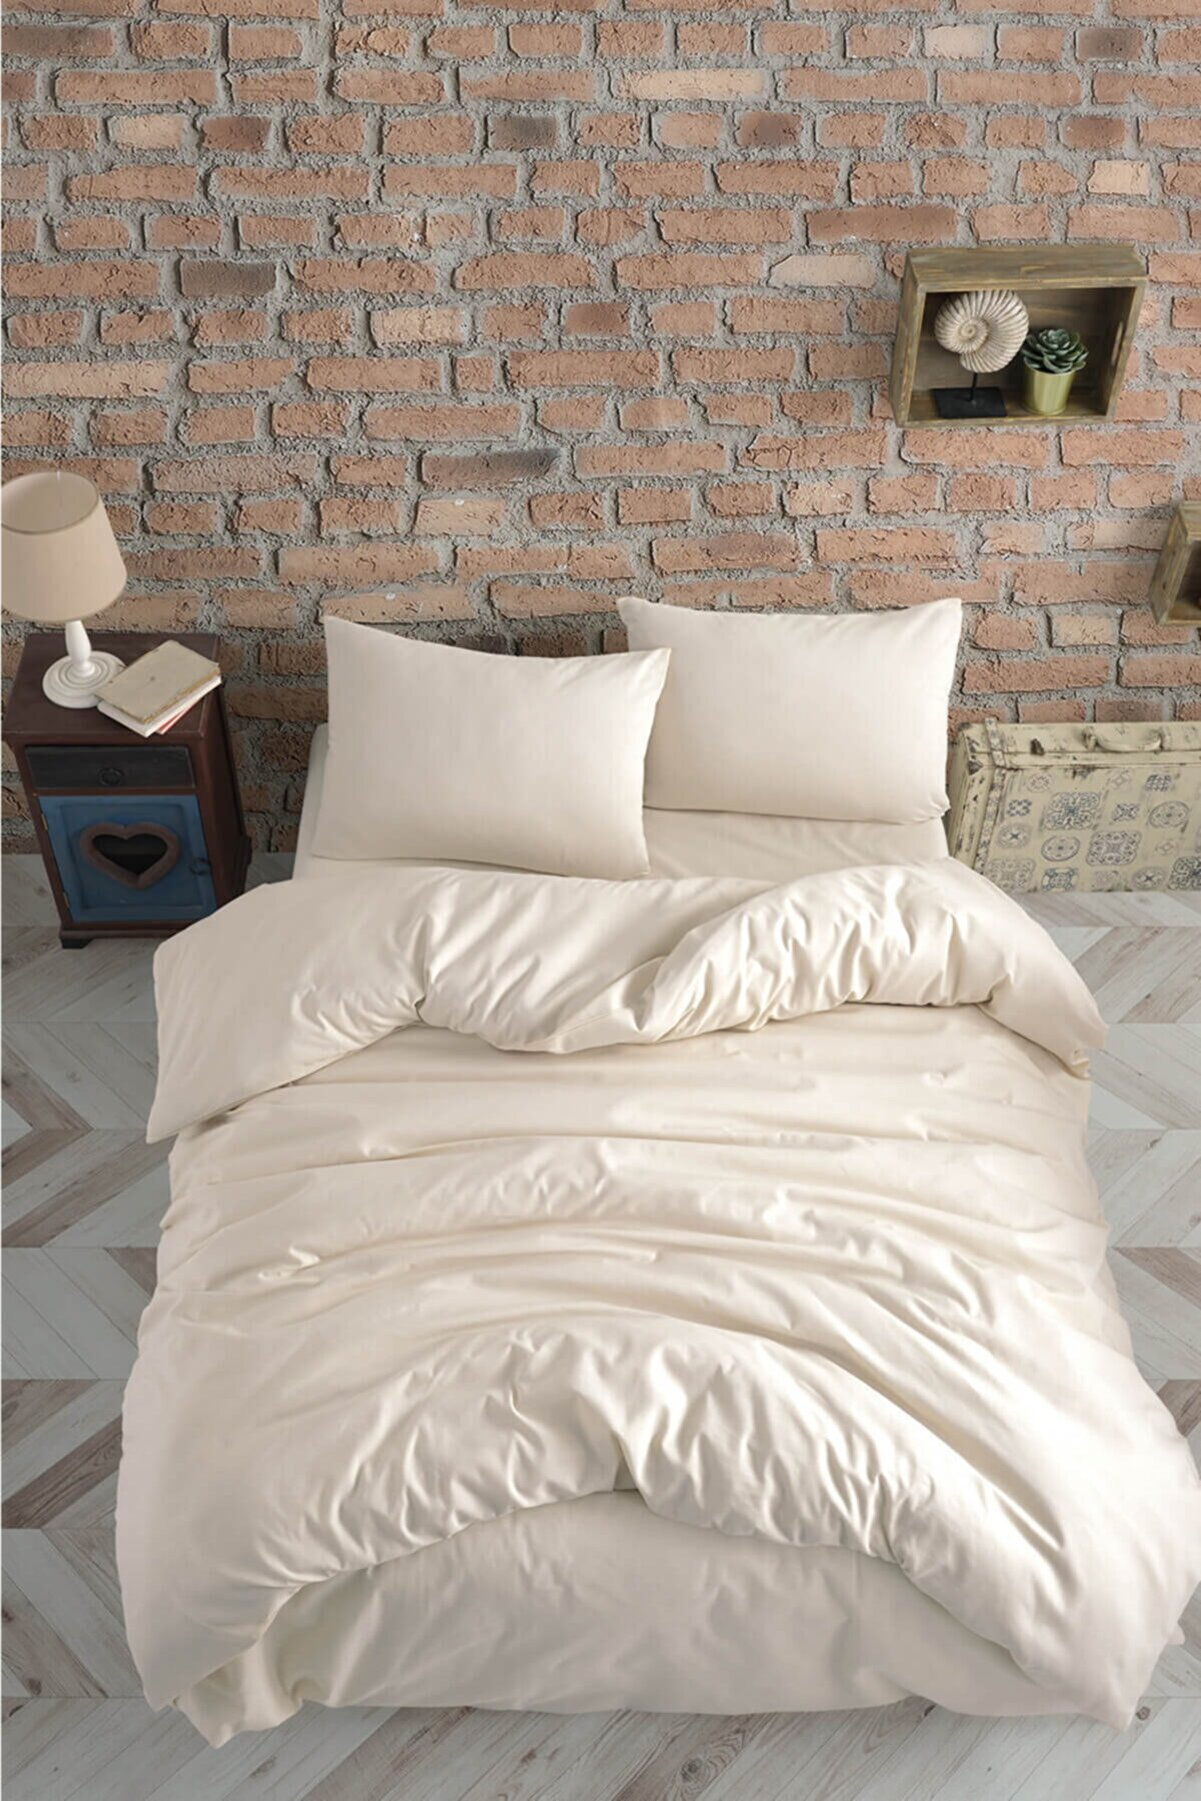 Cotton Touch Plain Series Ranforce Krem Çift Kişilik Nevresim Takımı